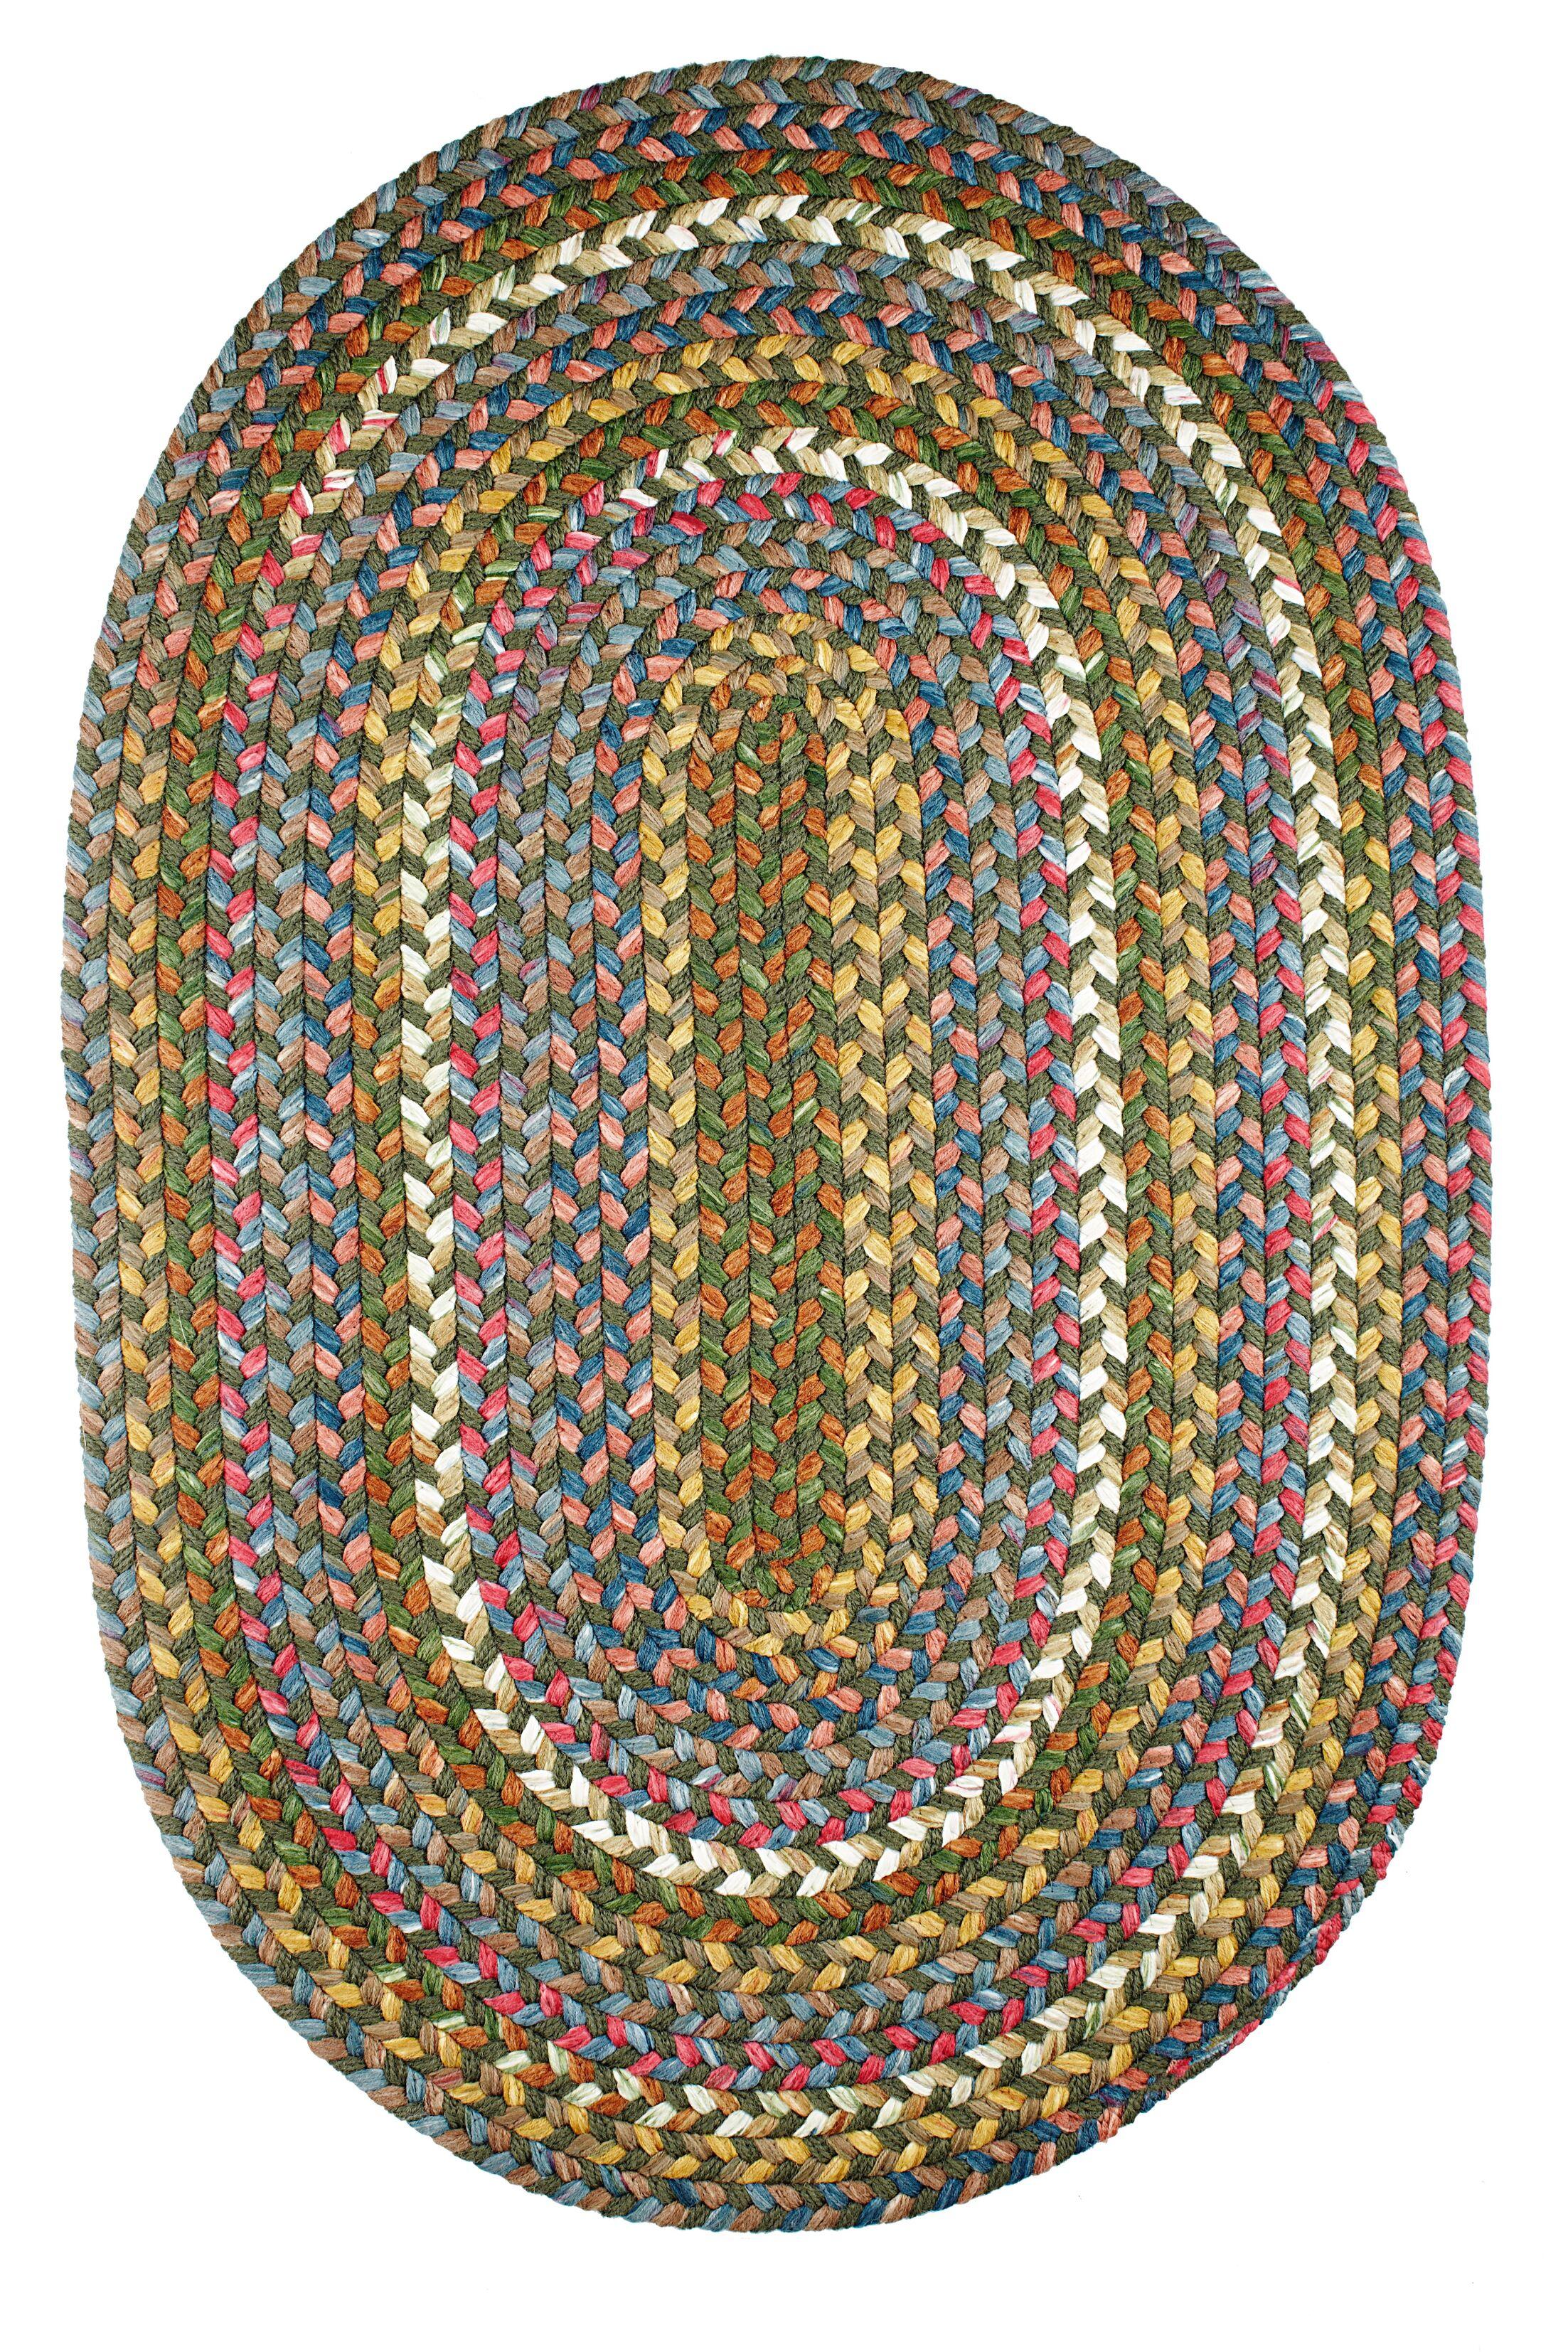 Handmade Indoor/Outdoor Area Rug Rug Size: Oval 7' x 9'